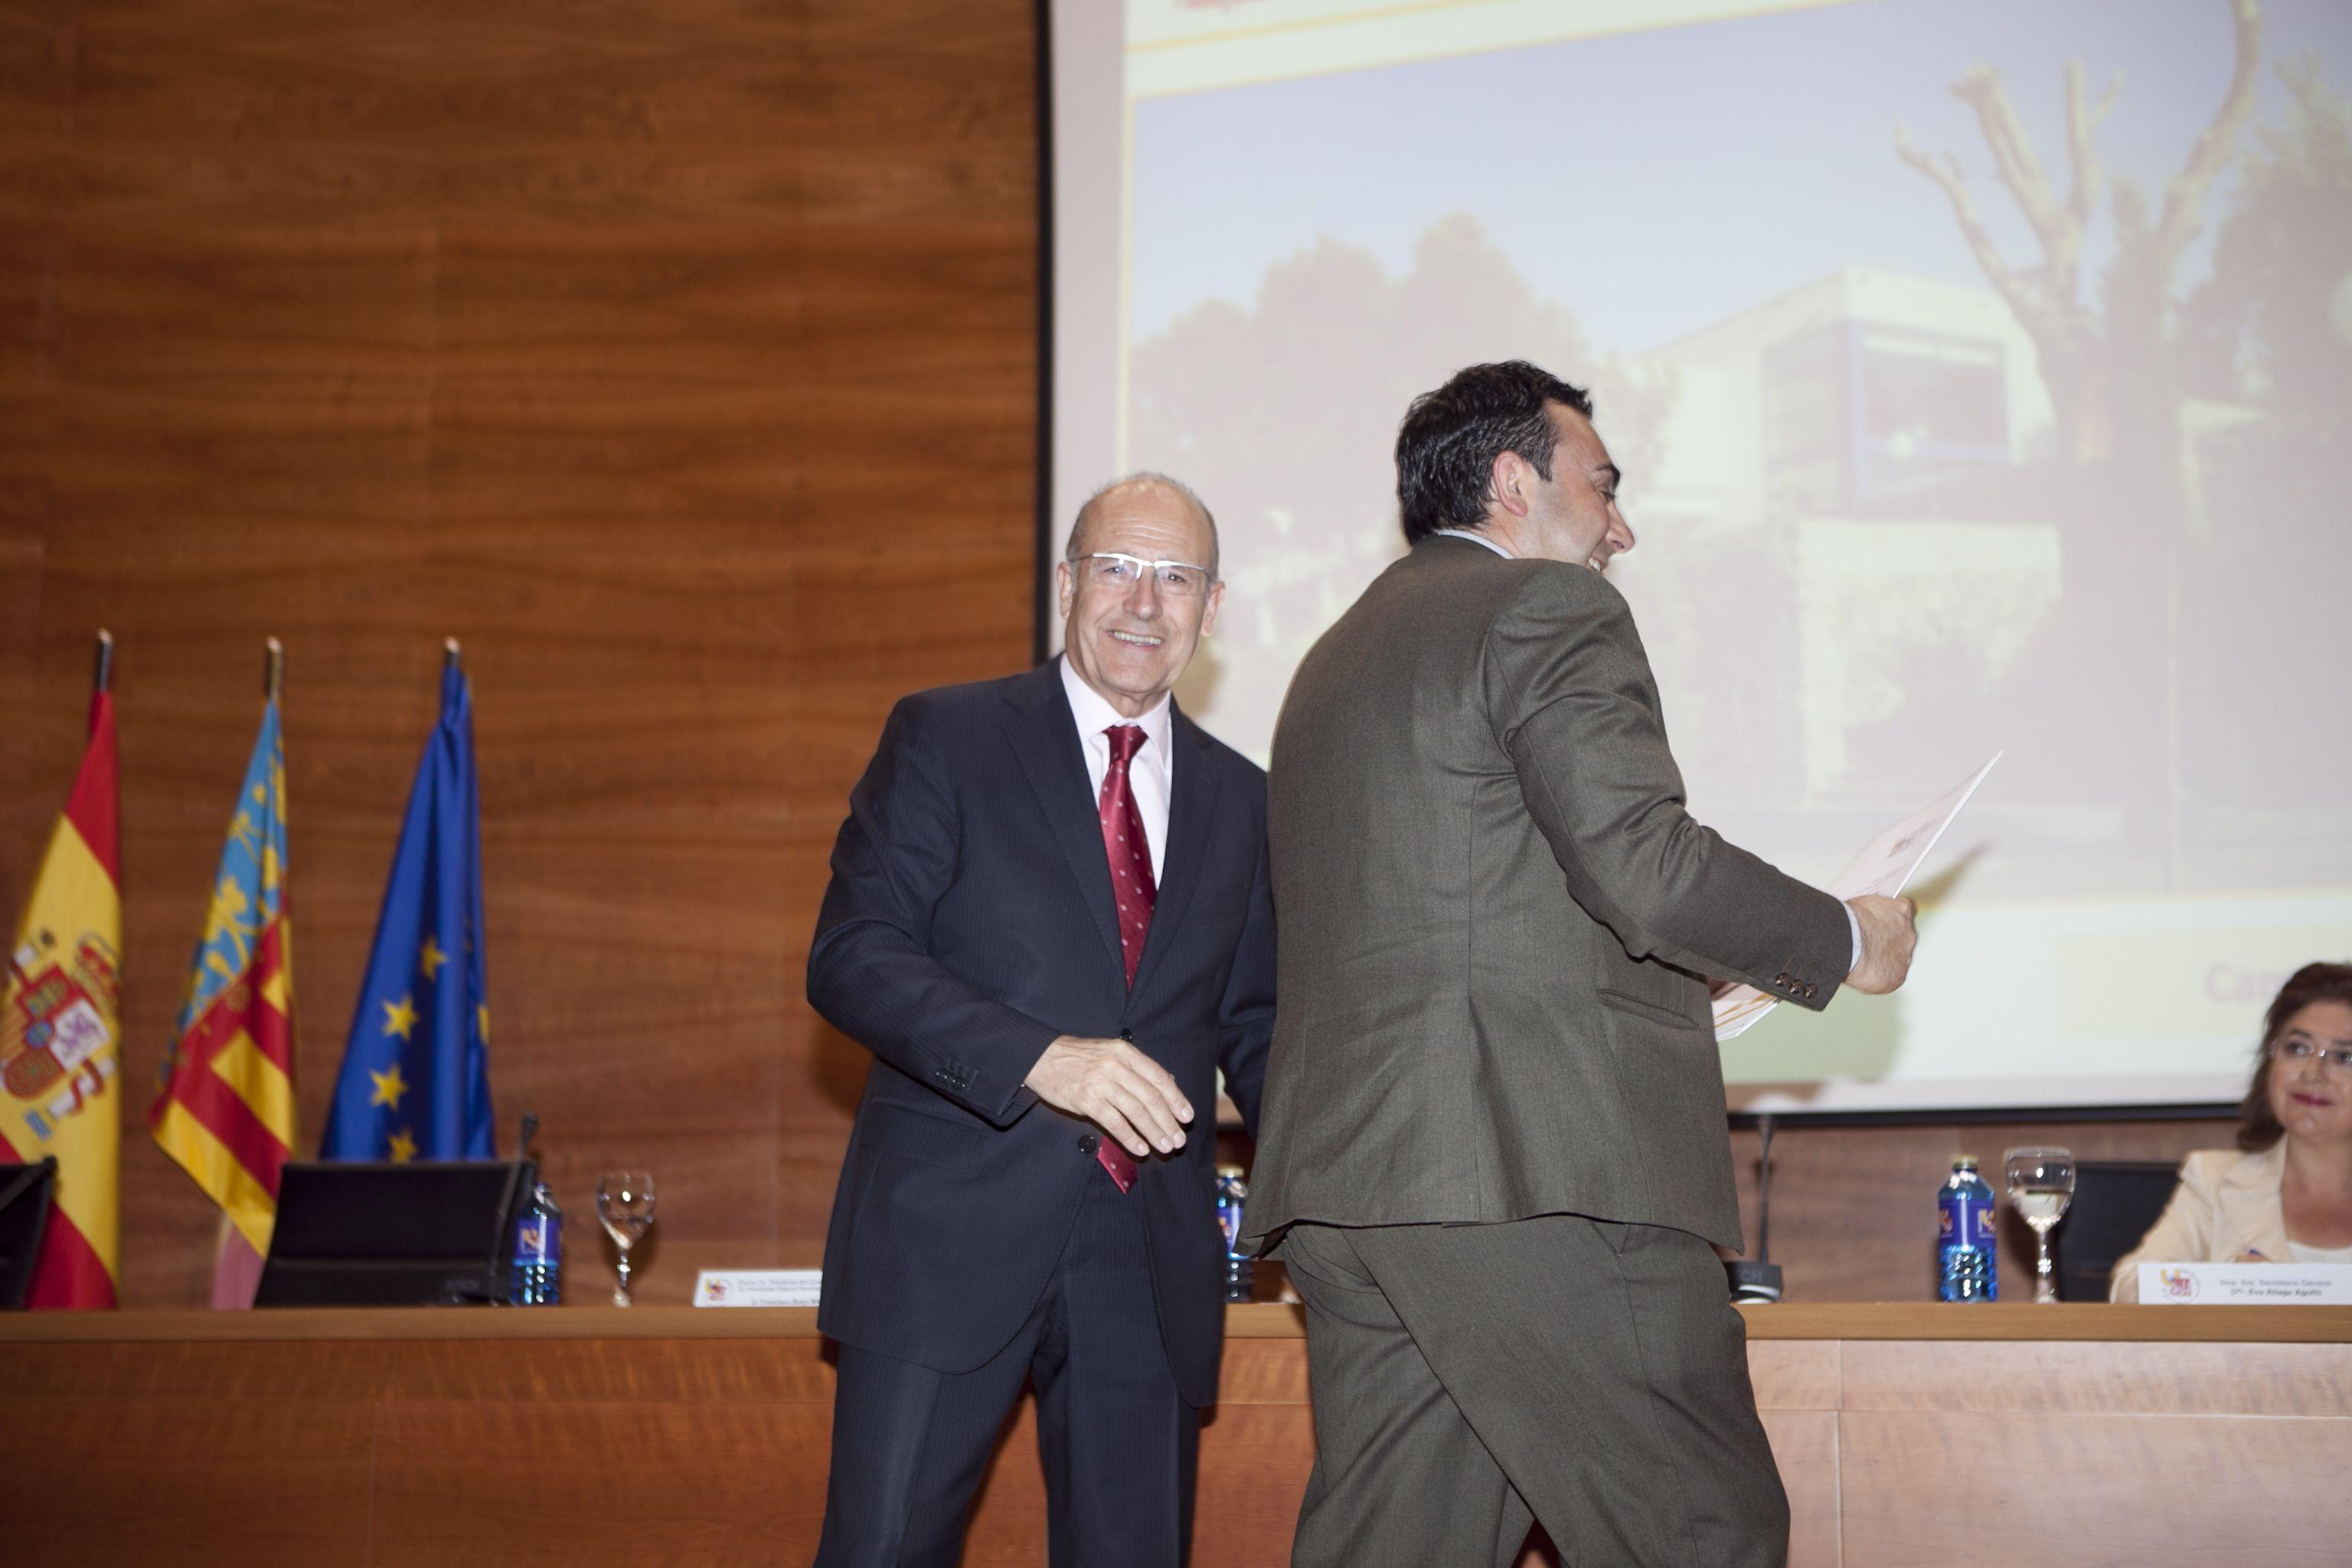 umh-diplomas-rector_mg_6509.jpg